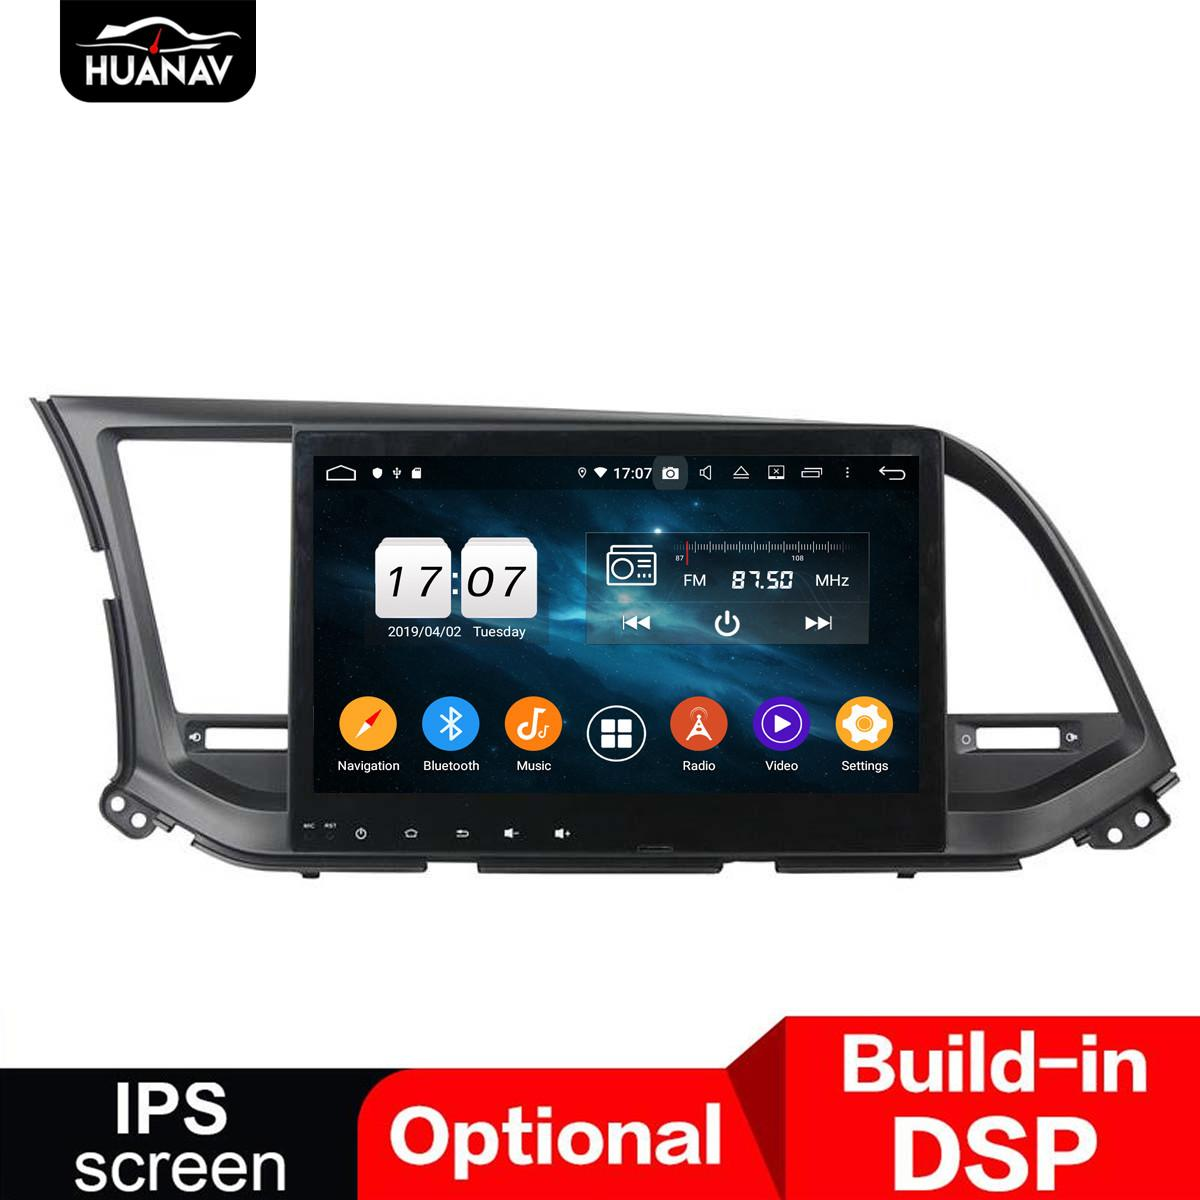 DSP 안드로이드 9.0 자동차 GPS 네비게이션 없음 DVD 플레이어 현대 Elantra 2016 자동차 라디오 플레이어 멀티미디어 스테레오 헤드 단위 테이프 NAV